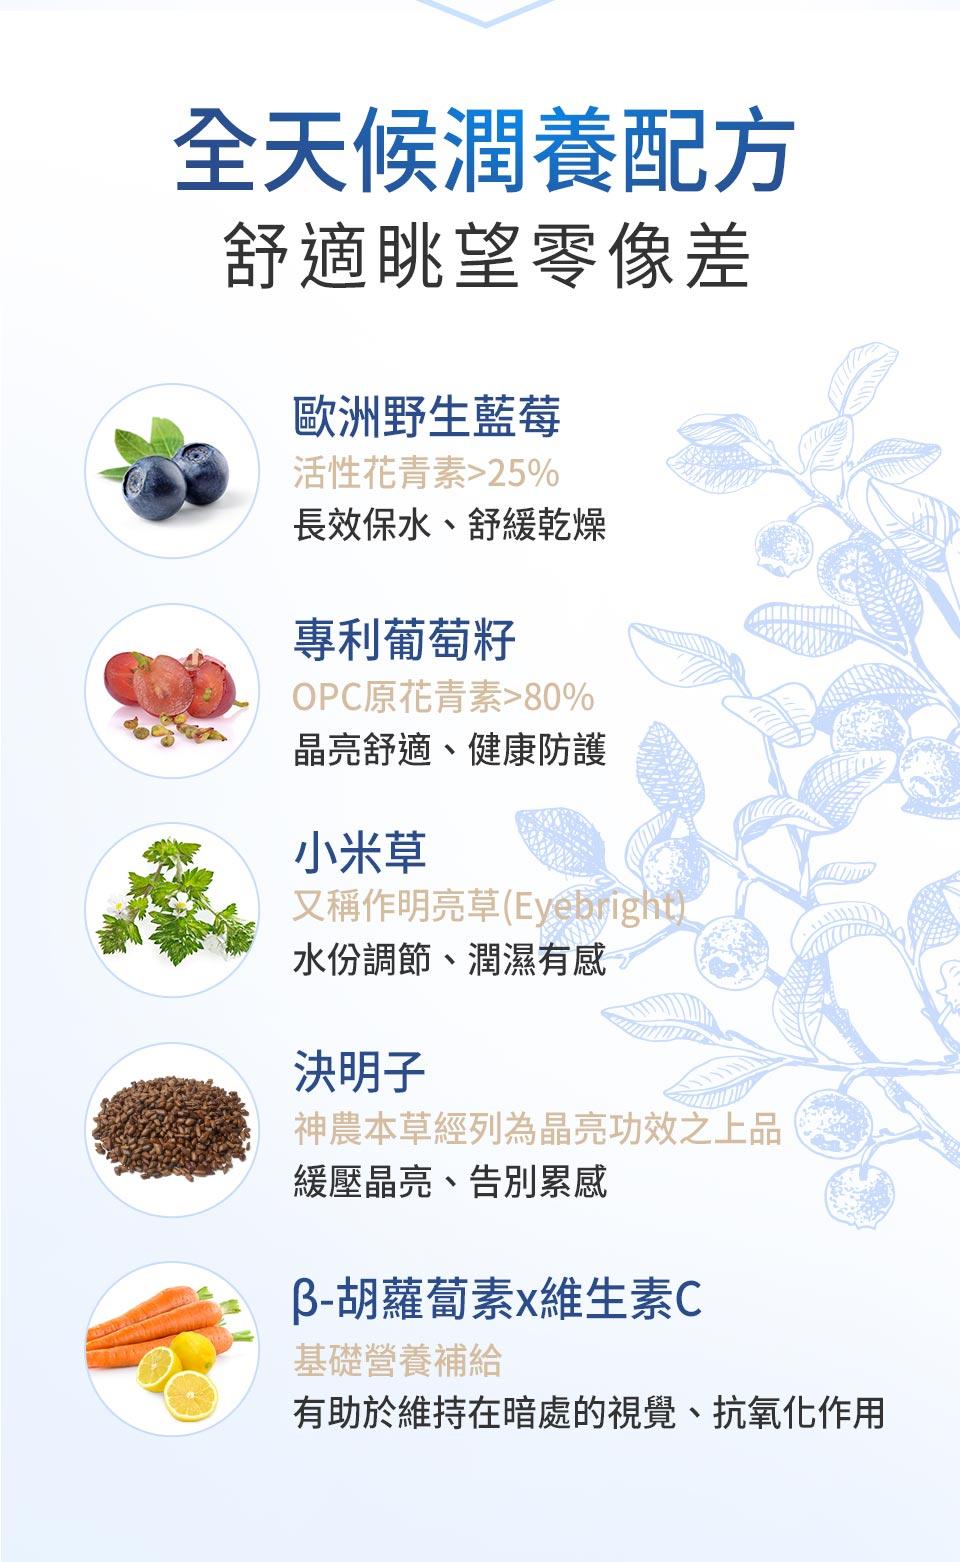 BHK藍莓山桑子添加歐洲野生藍莓,高活性花青素達25%以上、專利葡萄籽,OPC原花青素達80%以上、決明子、小米草、β-胡蘿蔔素、維生素C,有助於維持眼睛水潤感、舒緩乾澀、減輕眼壓、清晰有神、視線明亮、維持暗處視覺。